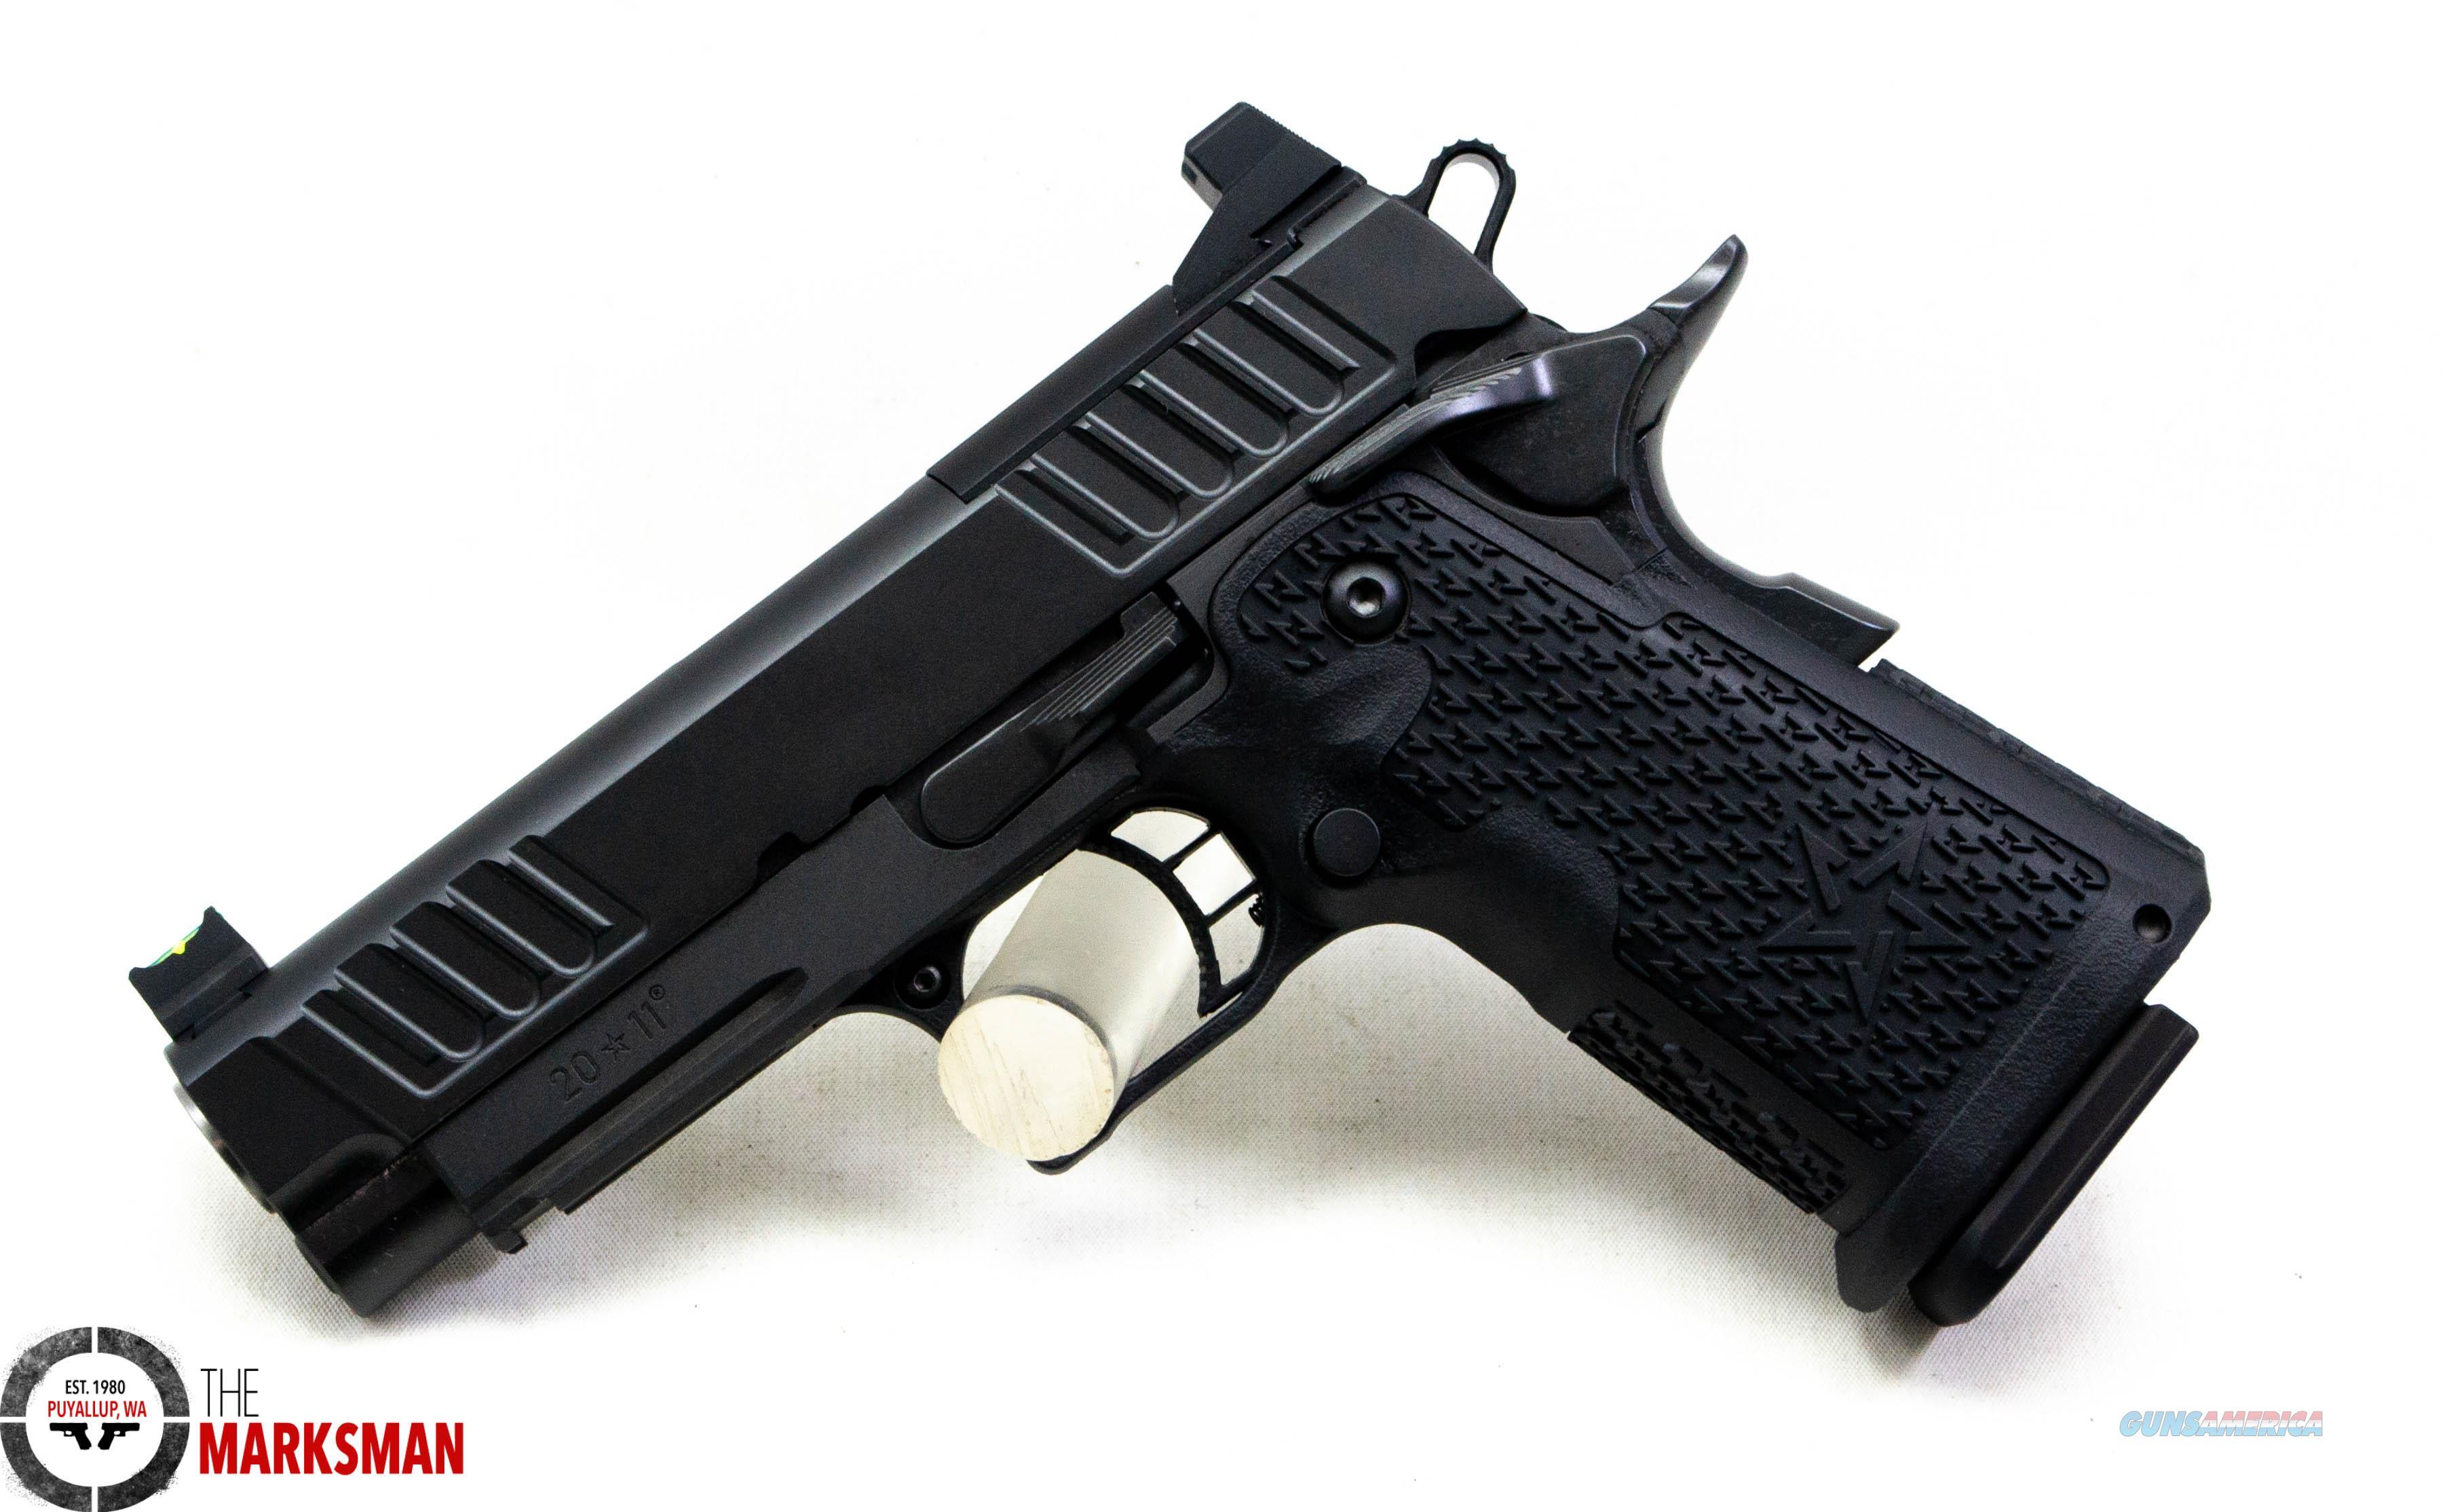 STI Speed Demons: 10 Competition Pistols From STI